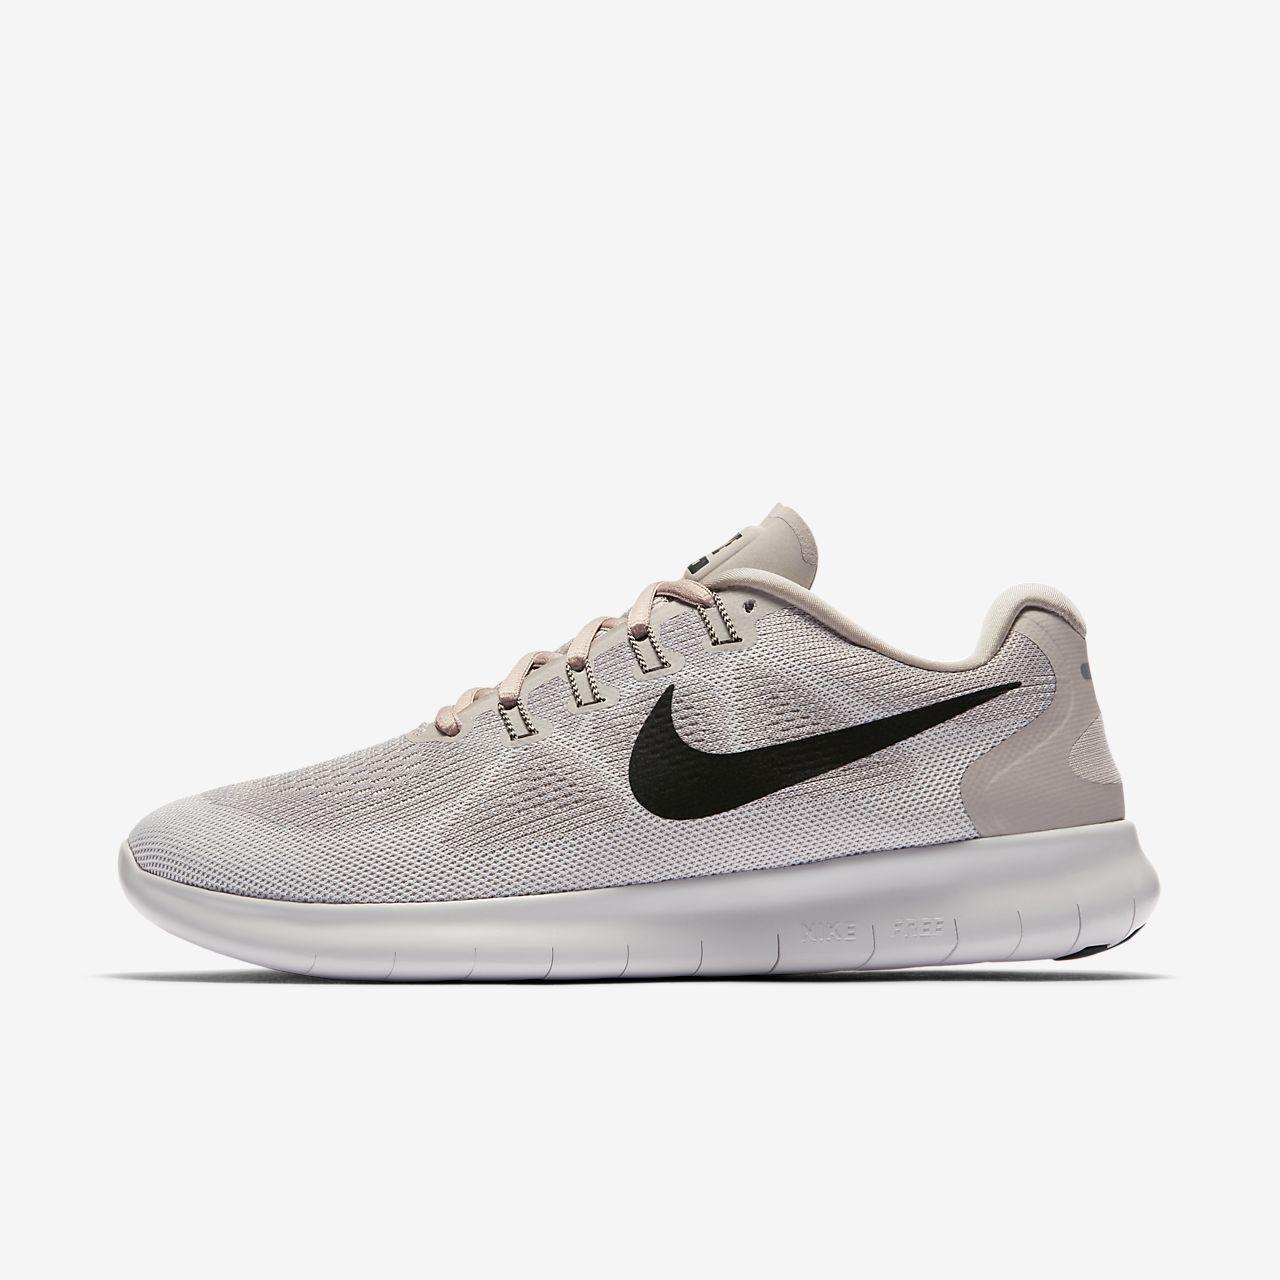 91b6c8247858d3 ... new zealand nike free rn 2017 womens running shoe b6495 79d97